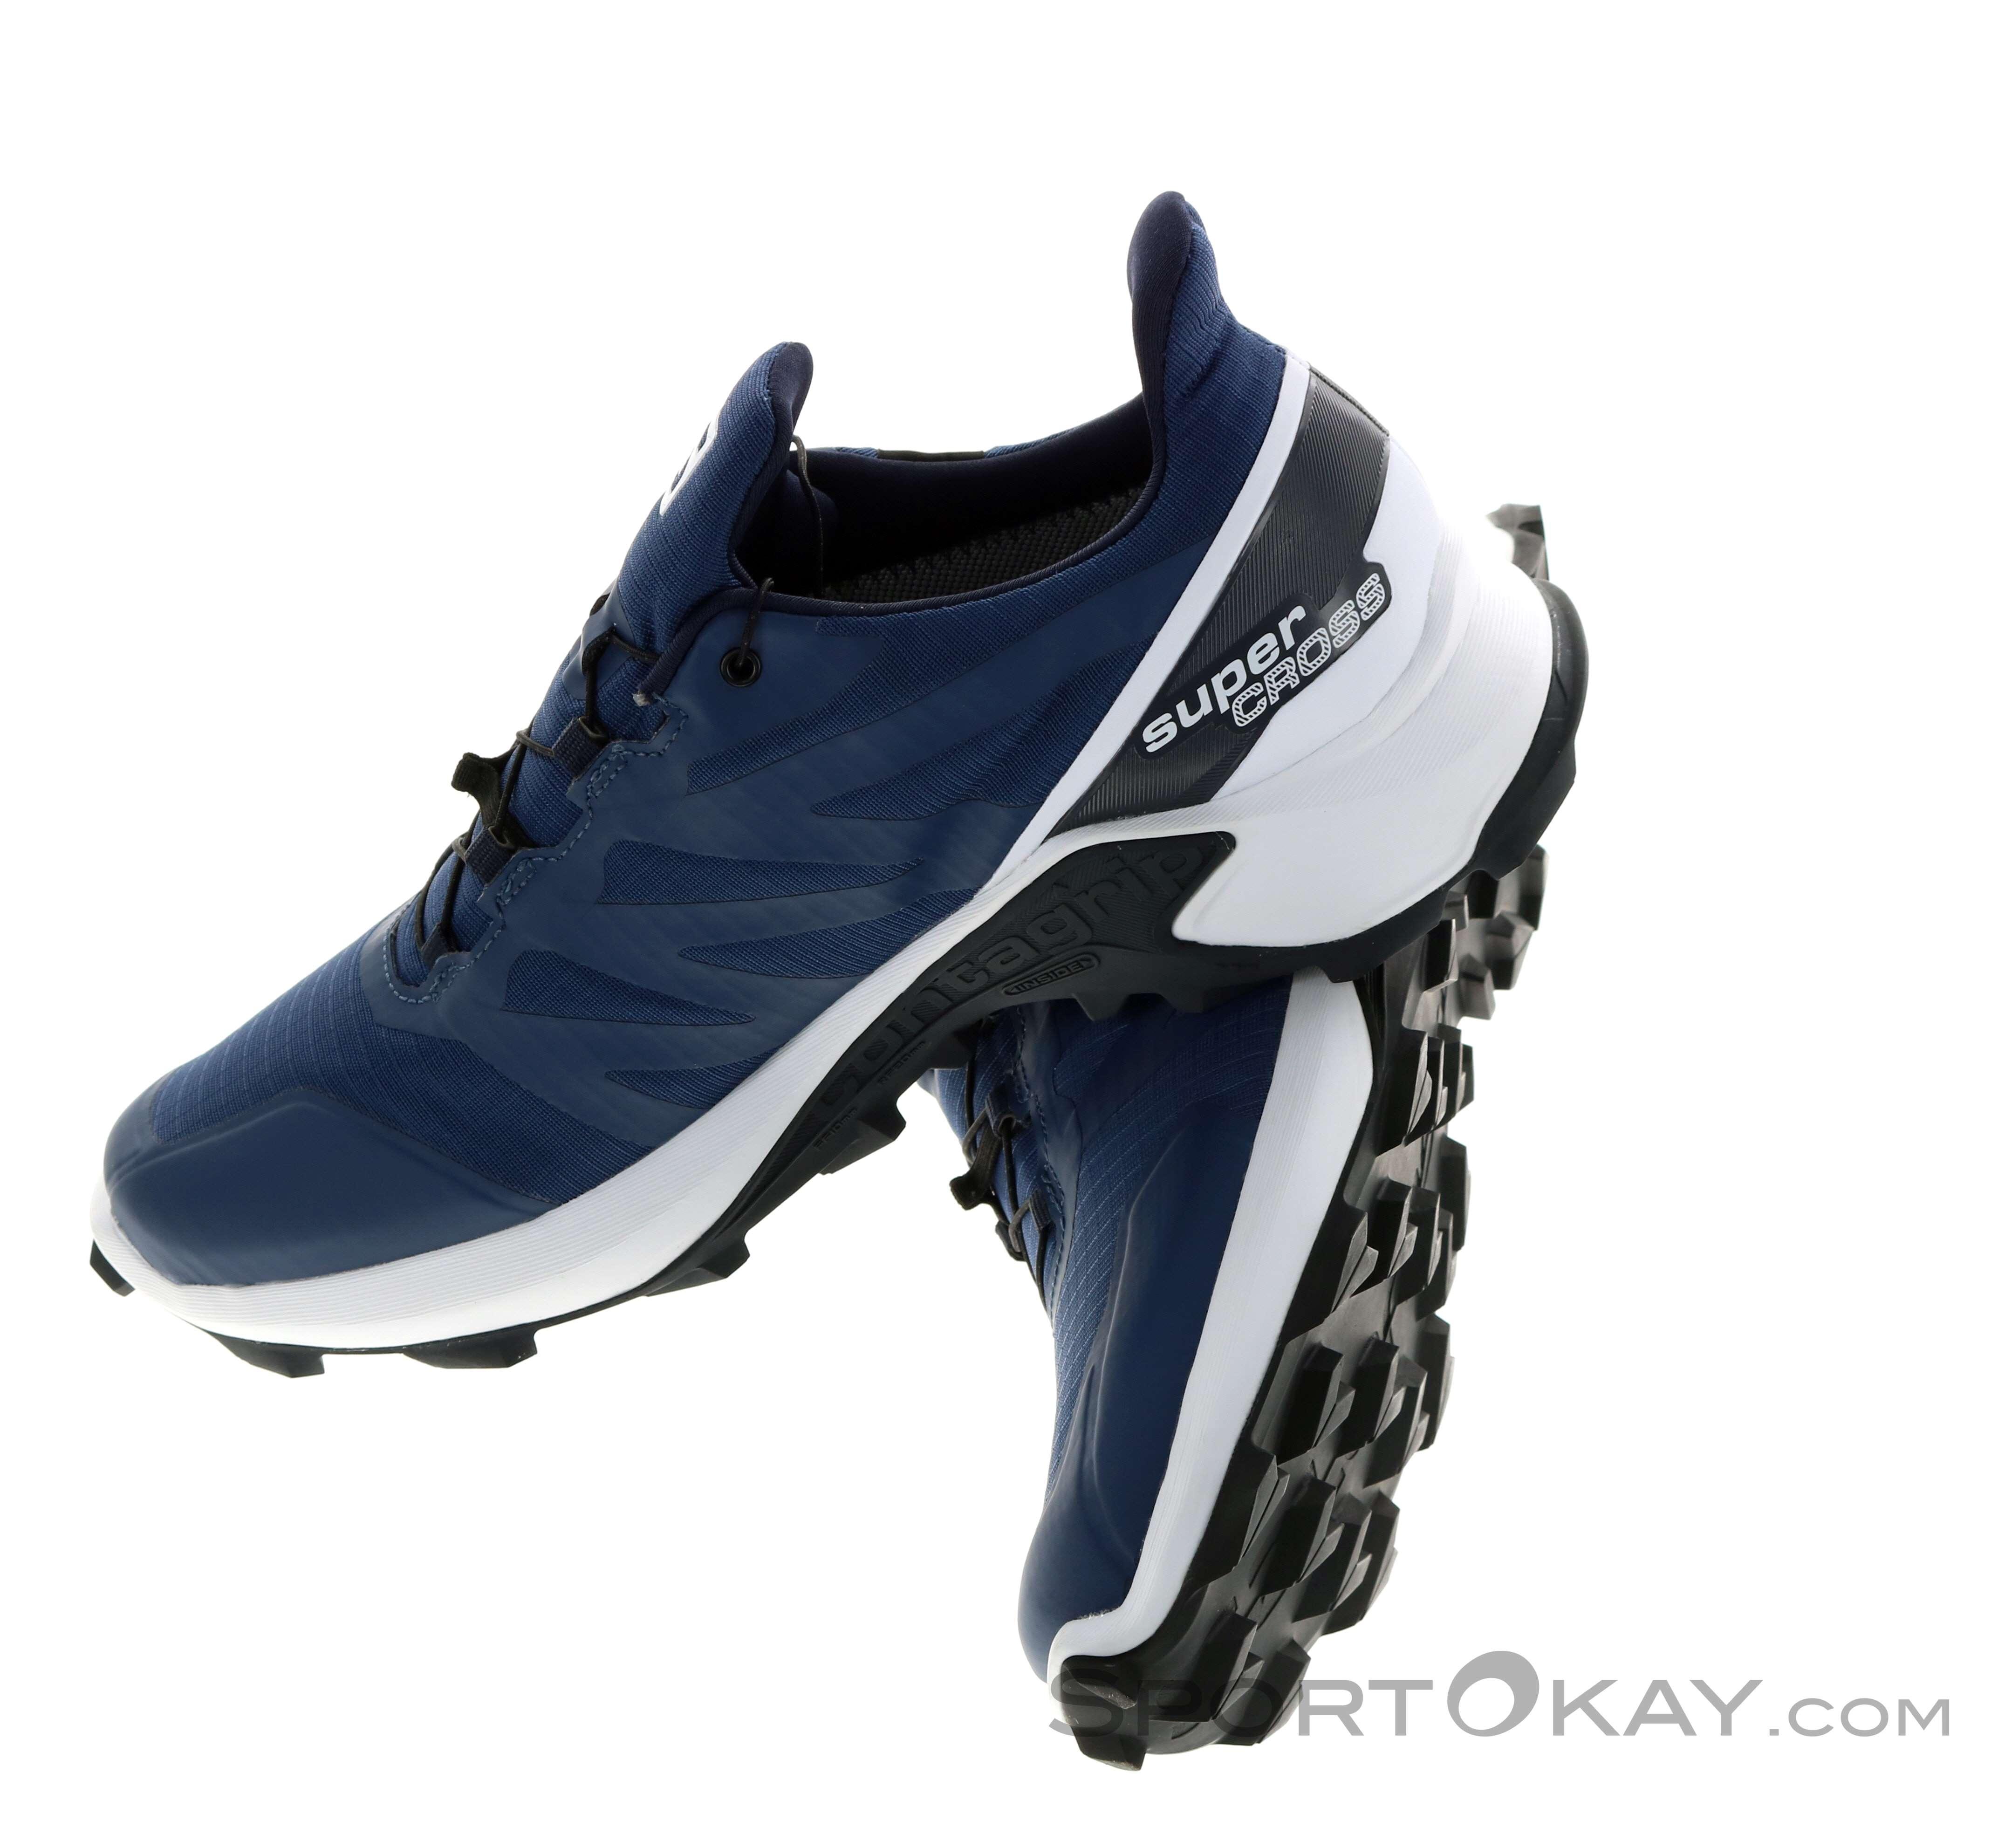 Salomon Salomon Supercross GTX Mens Trail Running Shoes Gore Tex